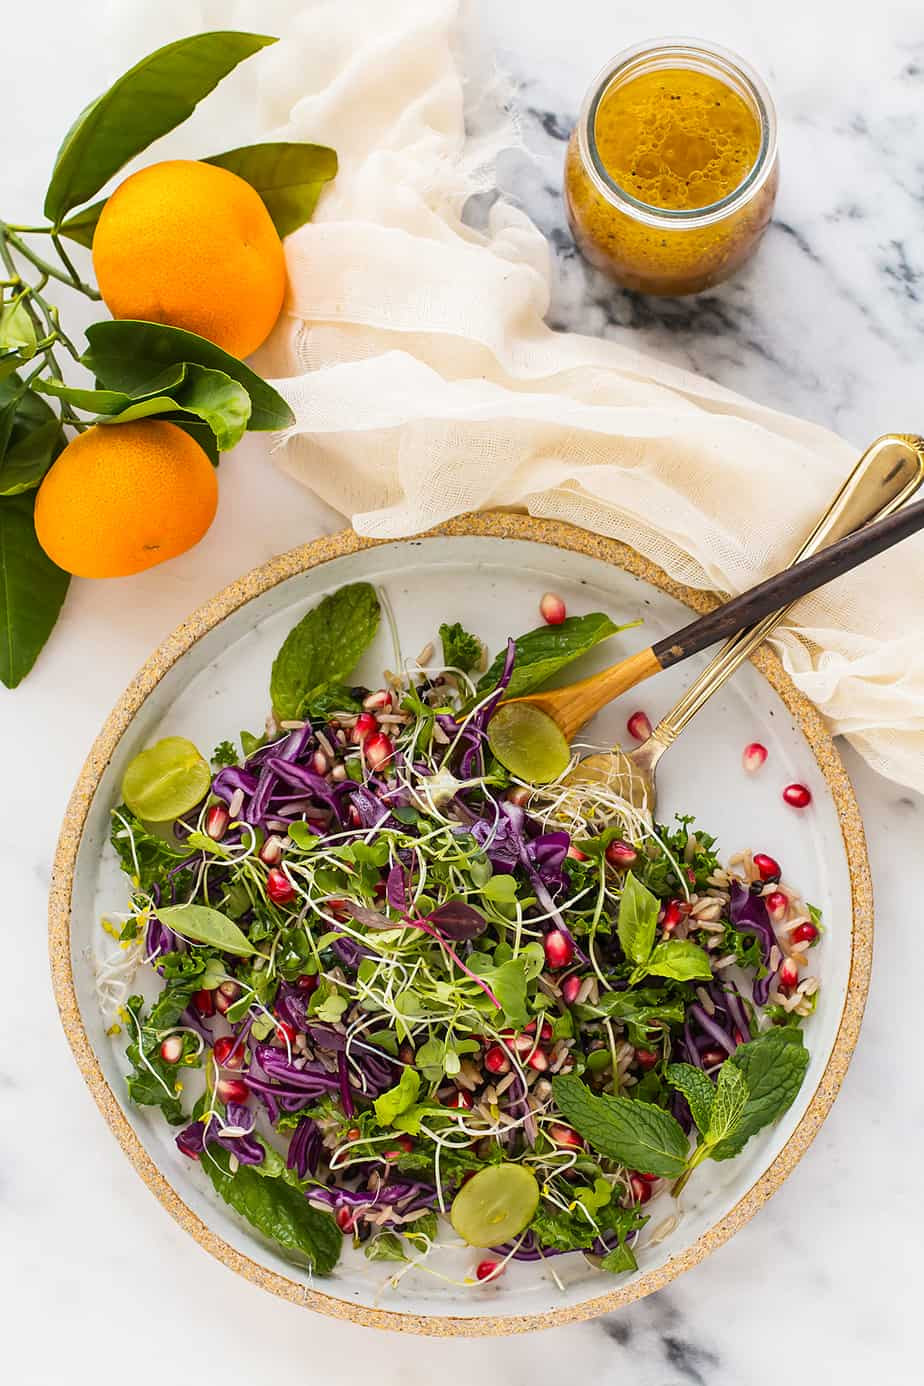 Fall Salad Dressings  Fall Salad with Orange Vinaigrette Dressing